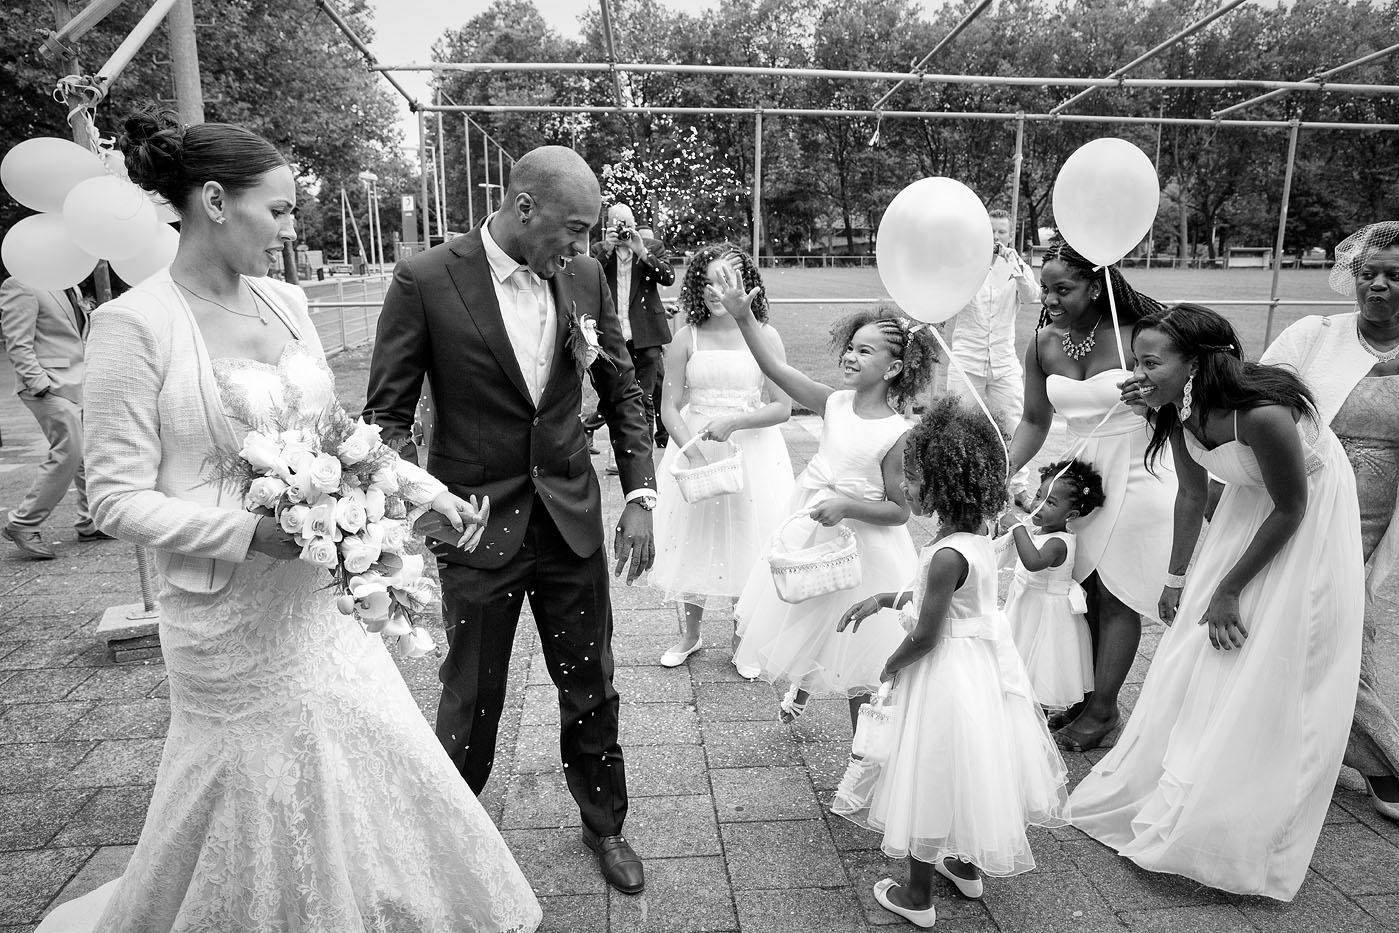 bruiloft-wedding-trouwen-rotterdam-fotograaf-bobhersbach-bruidsmeisjes